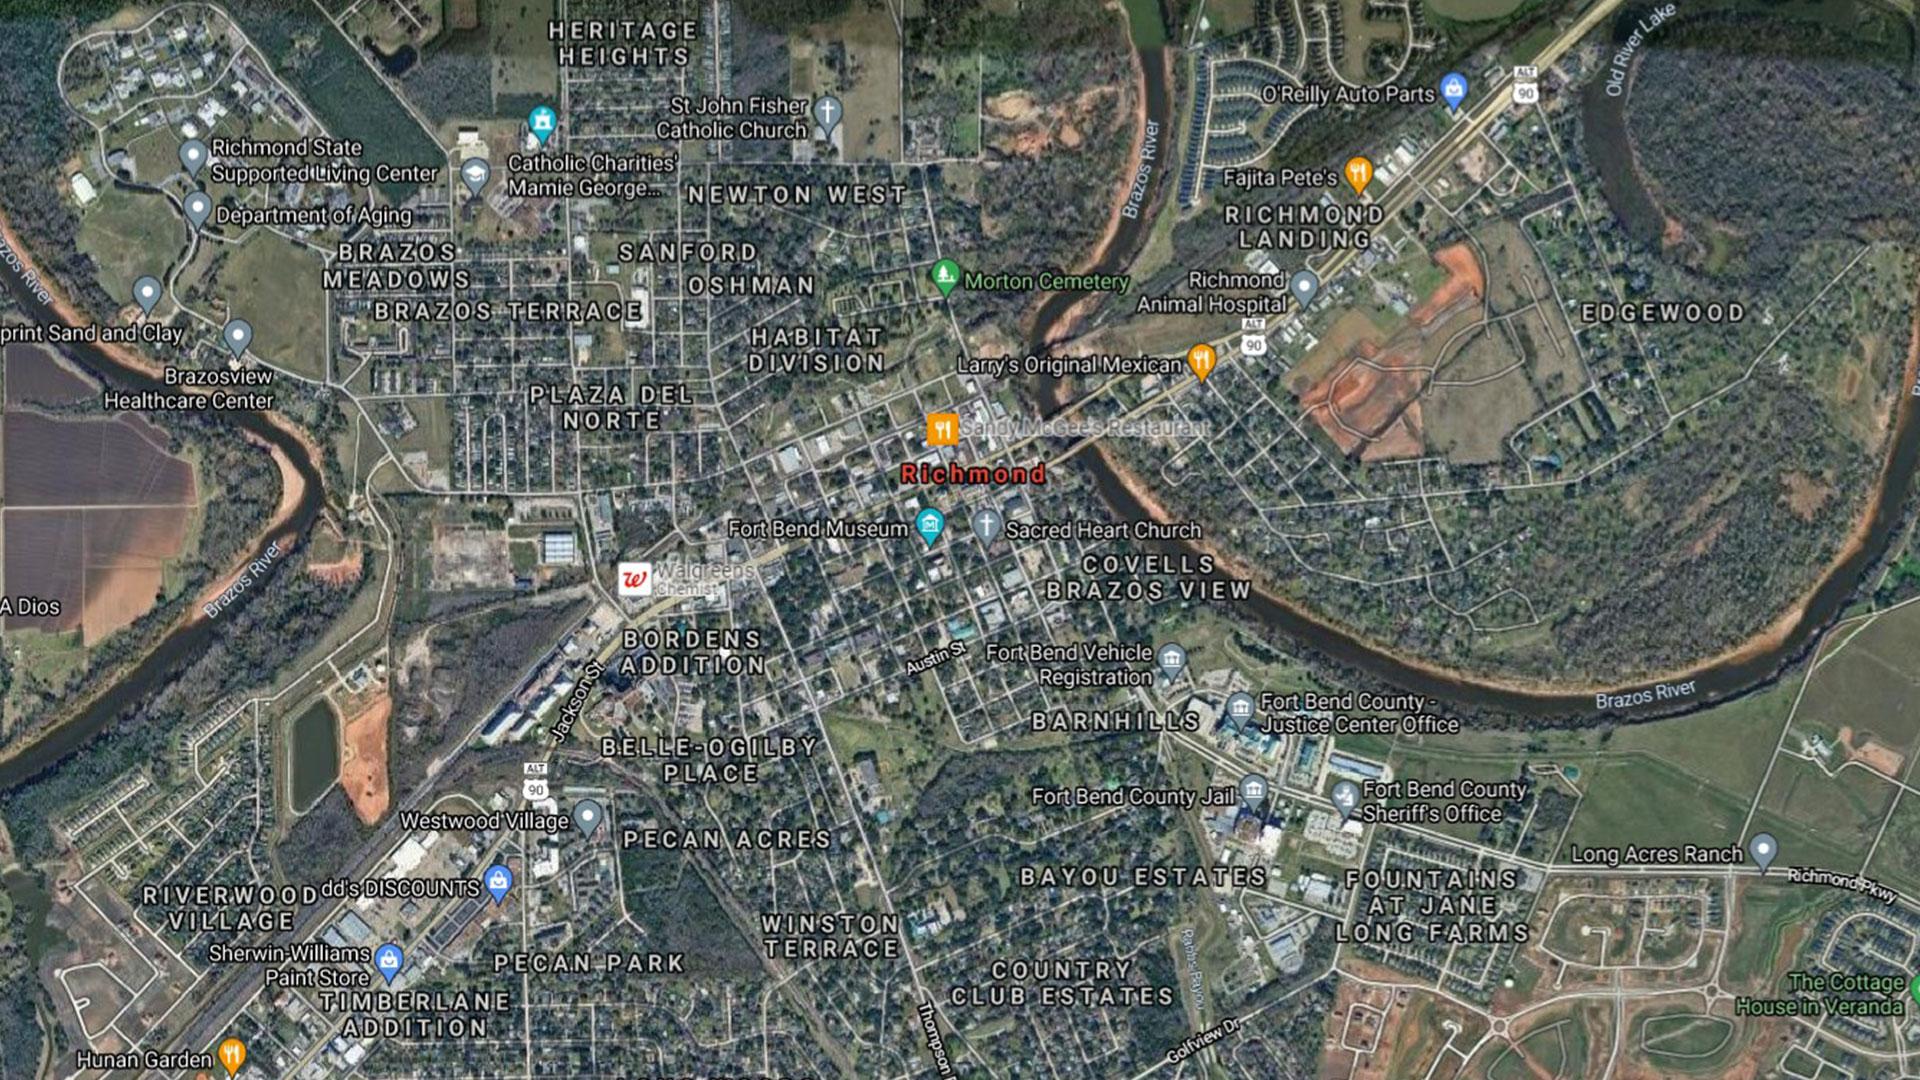 West-Houston-Neighborhood-RICHMOND